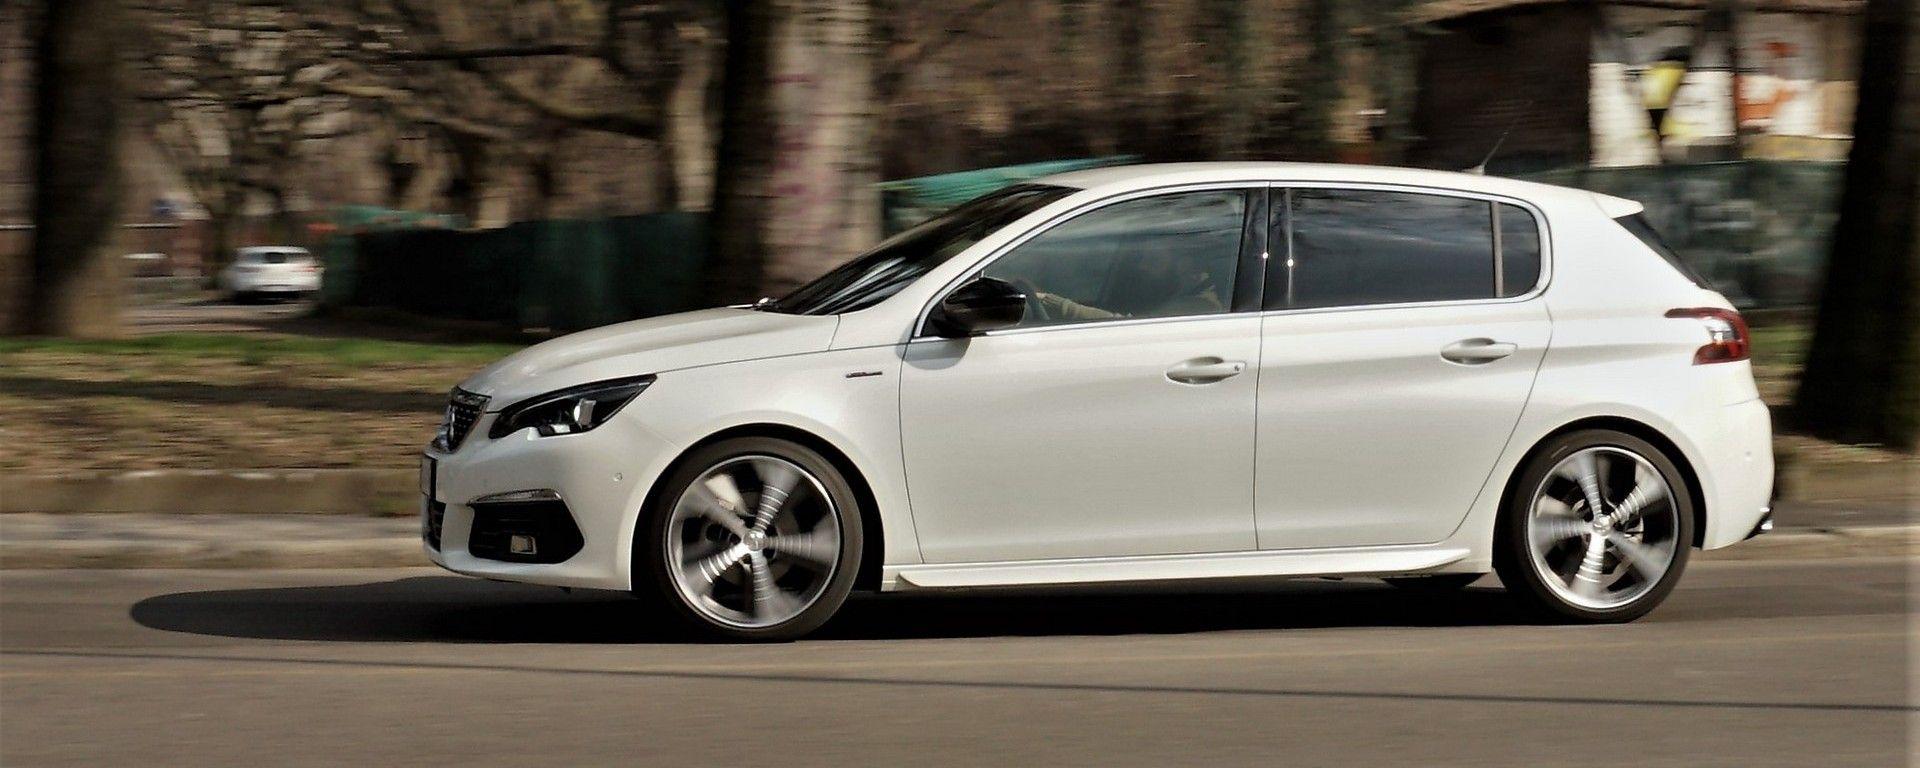 Peugeot 308 1.5 BlueHDI 130 CV GT-Line, la prova